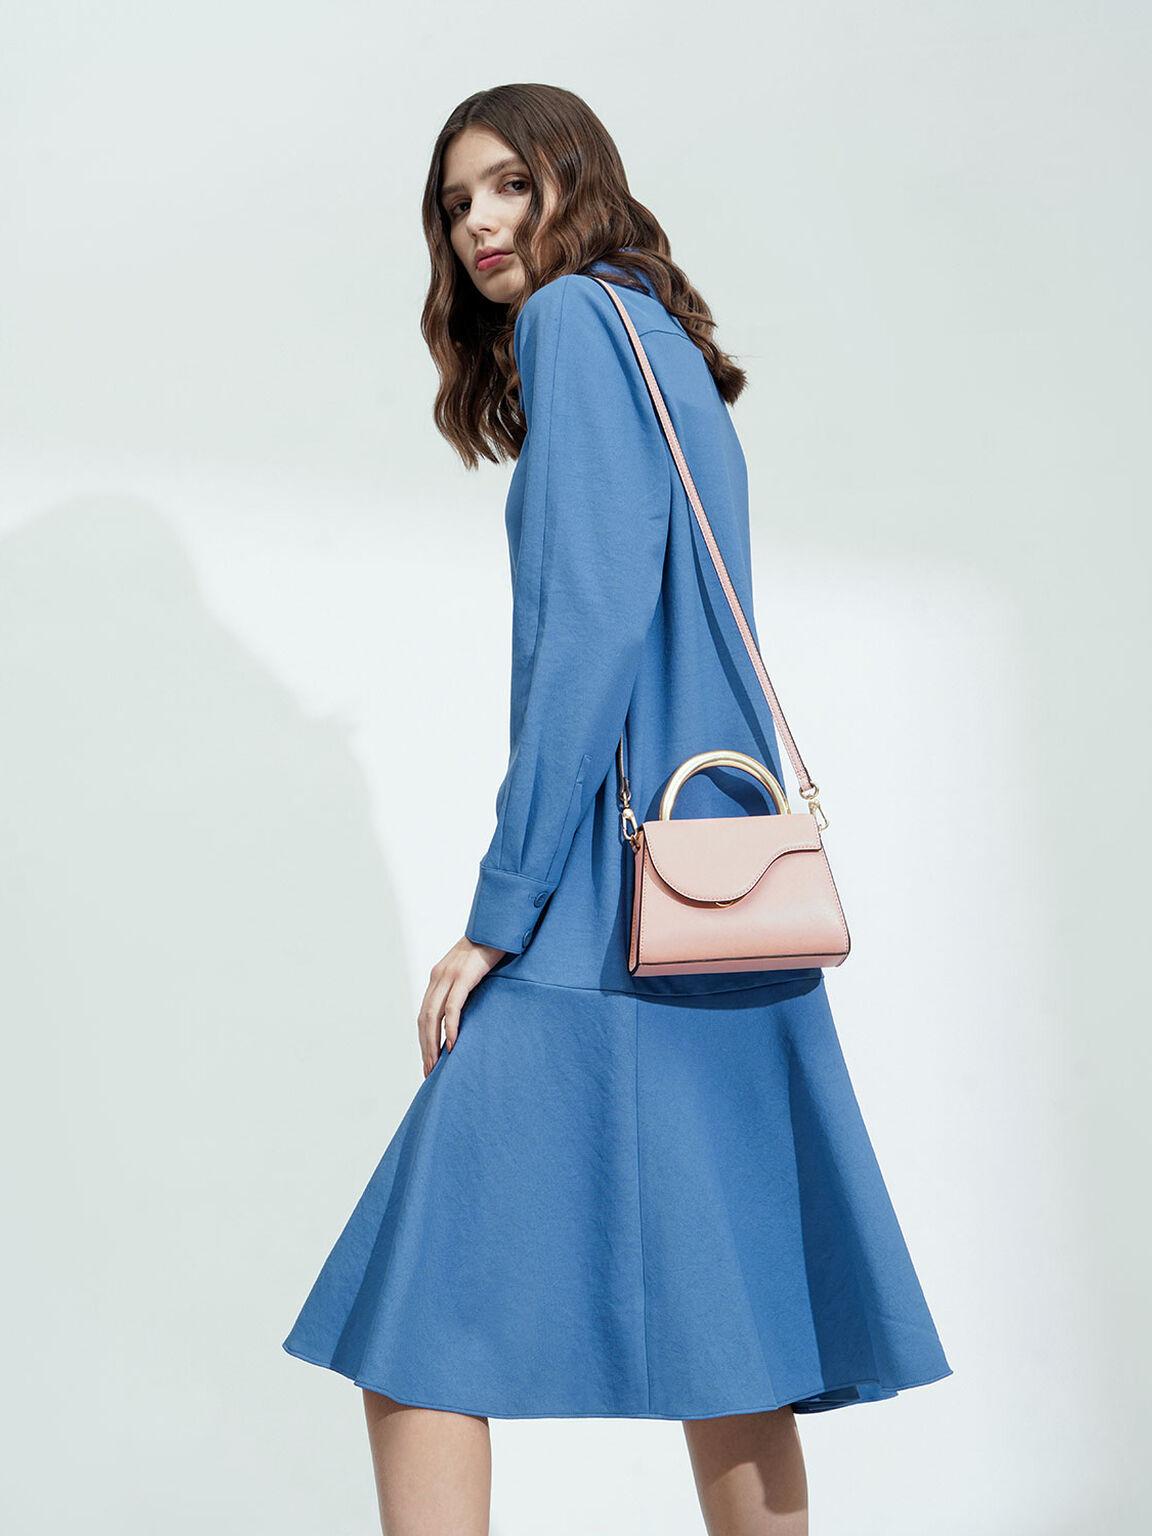 小型金屬手提包, 粉紅色, hi-res